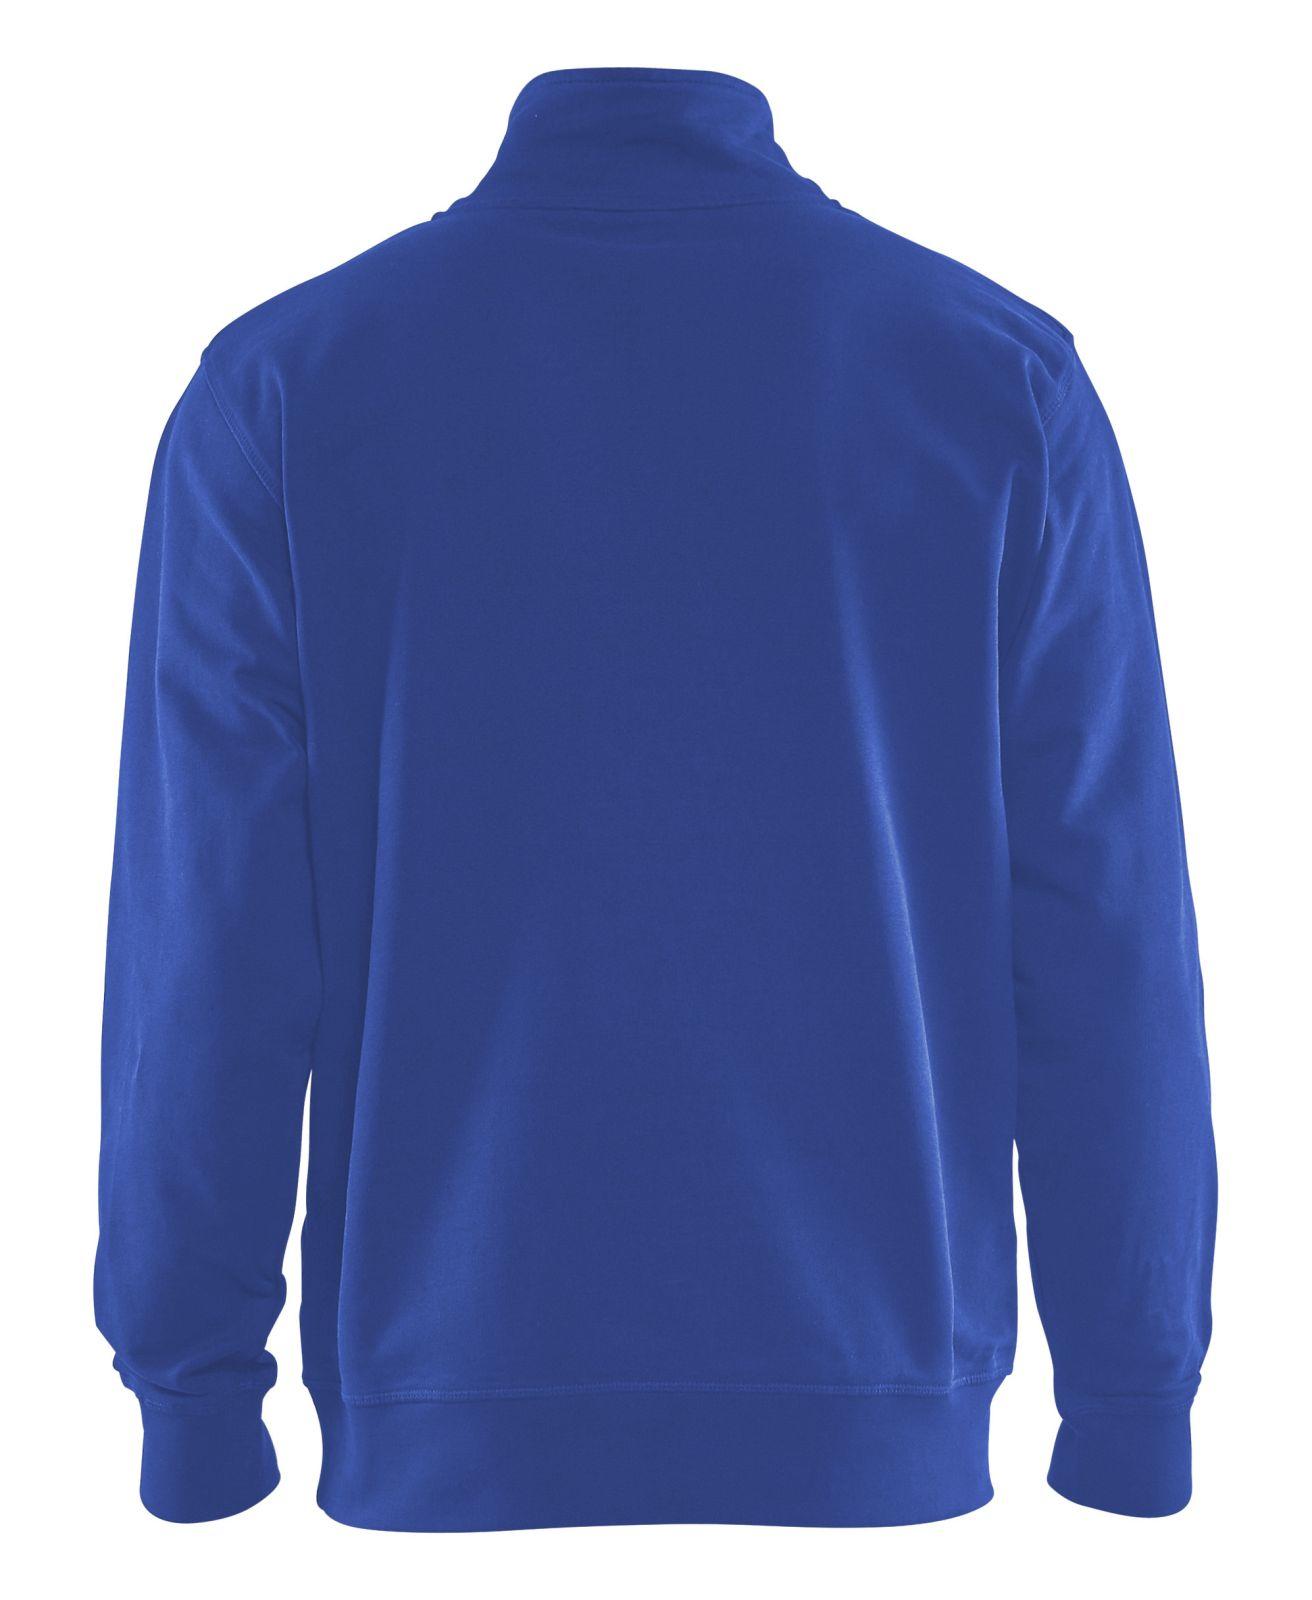 Blaklader Sweatshirts 33531158 korenblauw-zwart(8599)